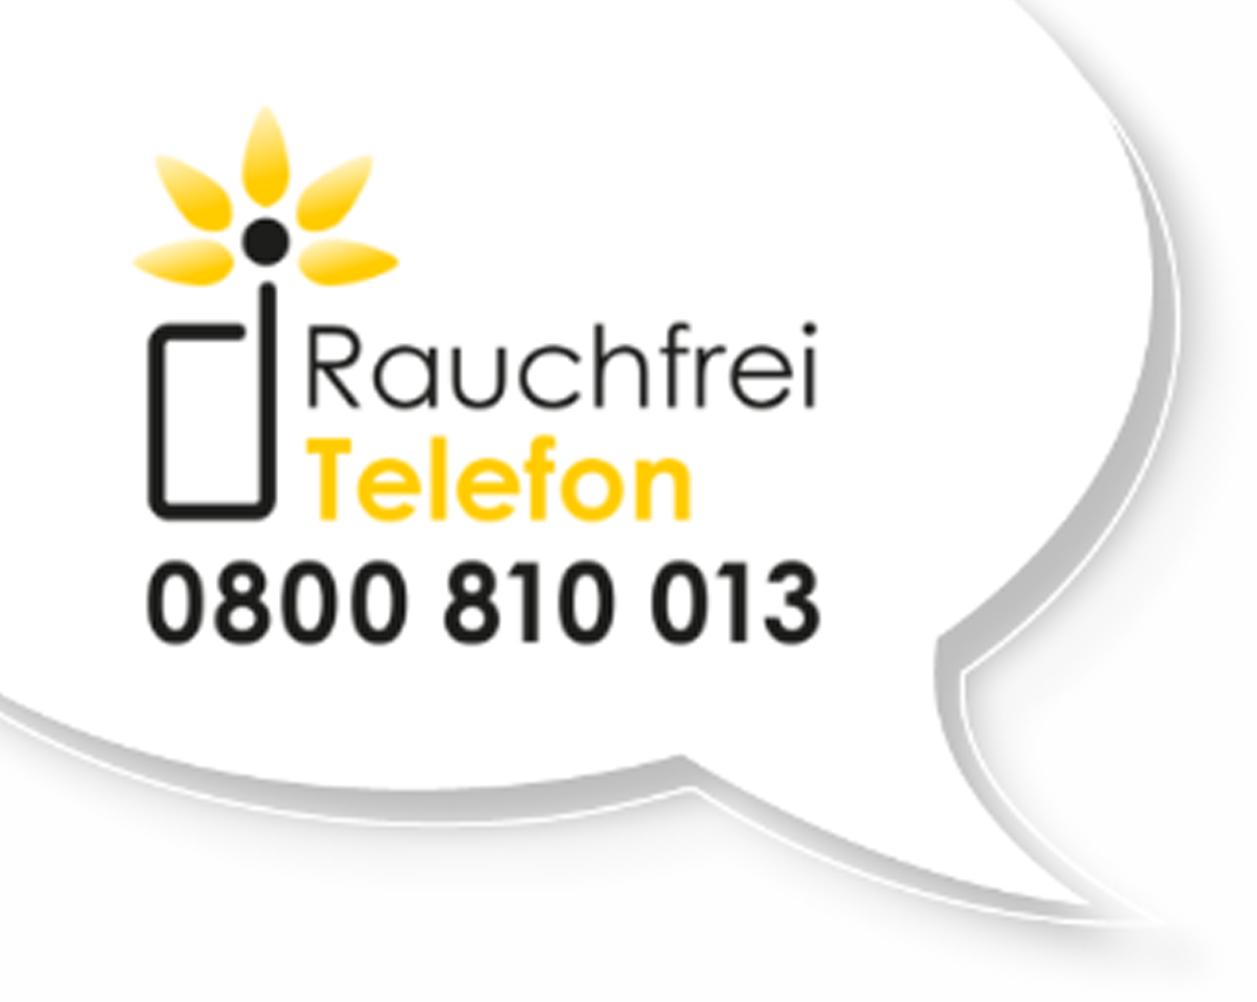 Rauchfrei Telefon